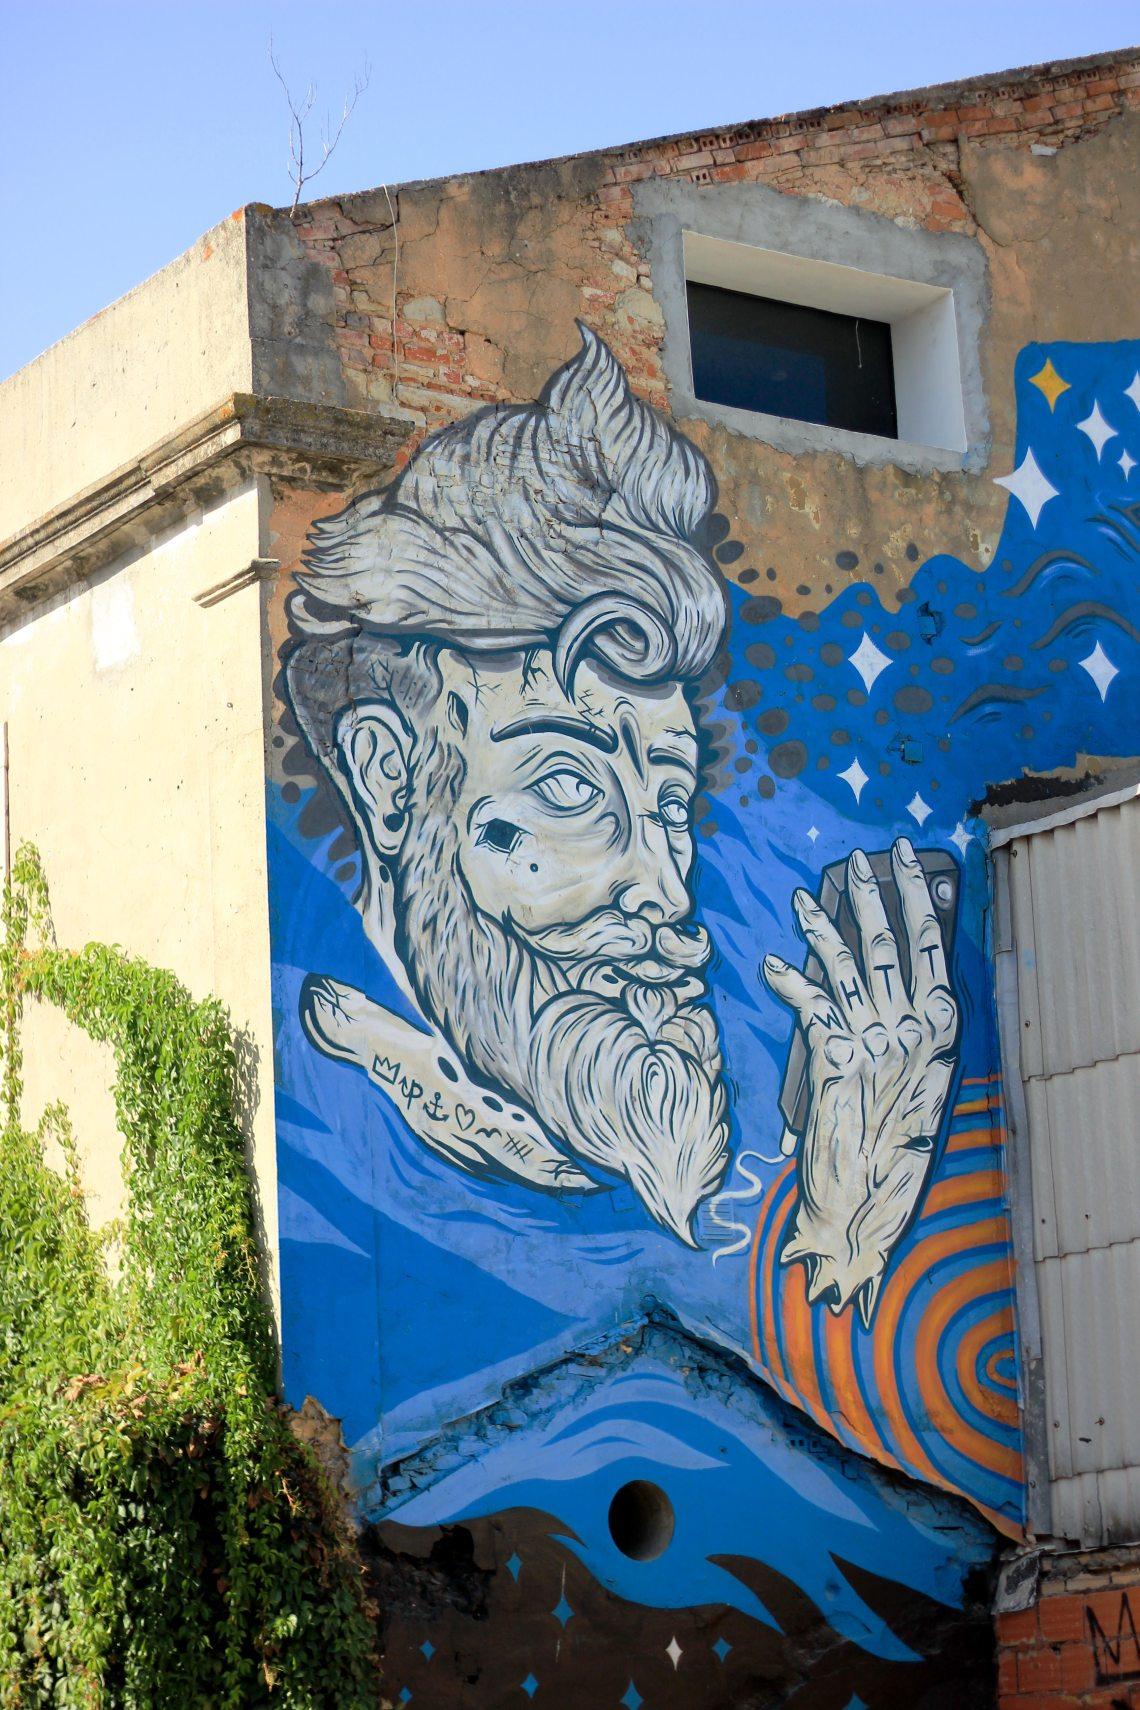 Lx-factory-street-art-Lisbonne